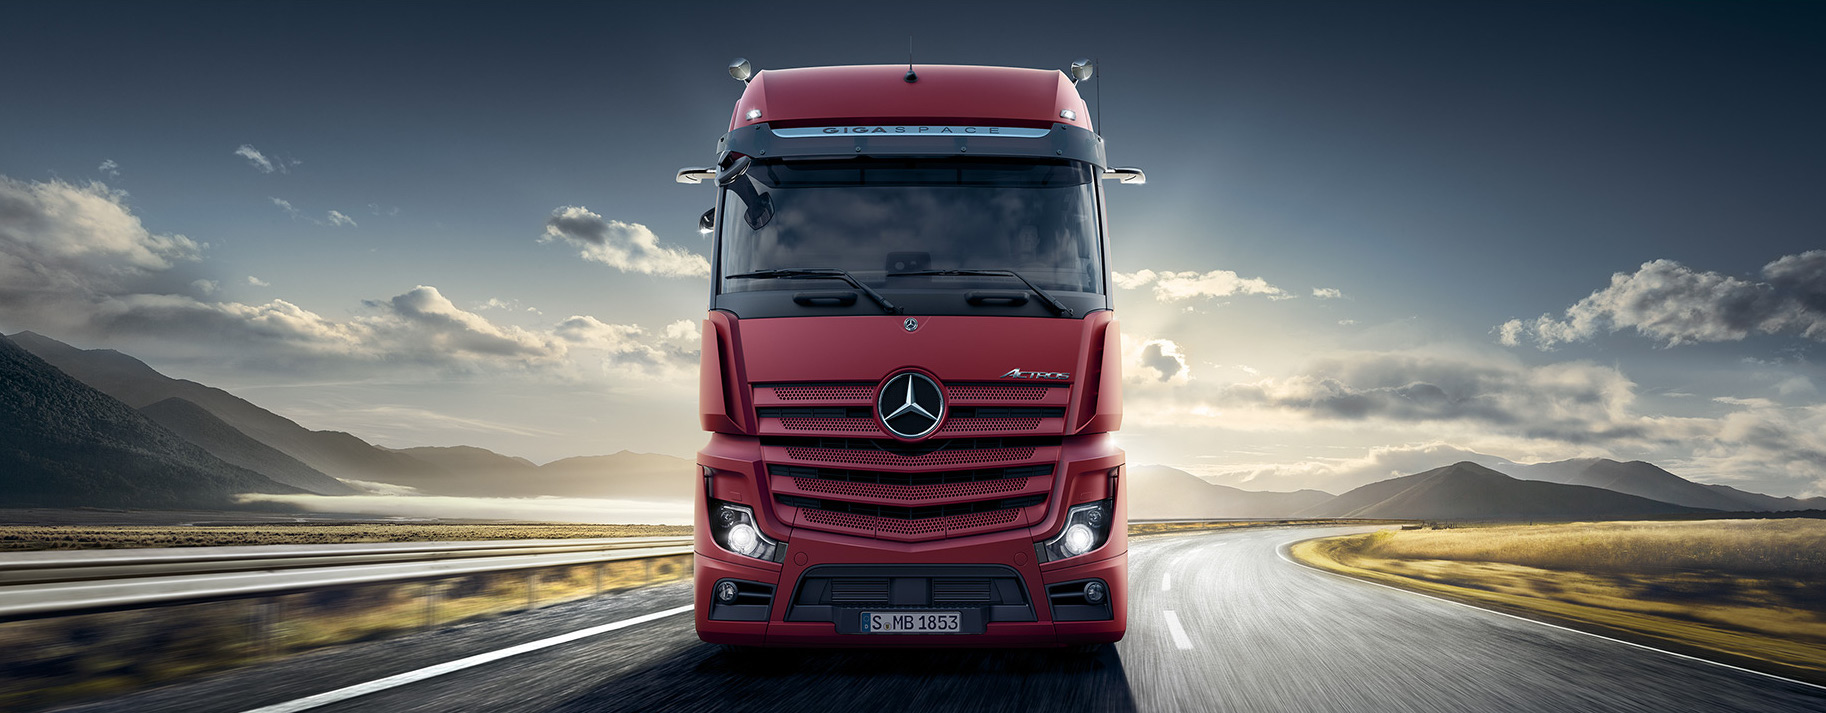 Mercedes-Benz Actros 3336 LS 6x4 Fernverkehr LKW